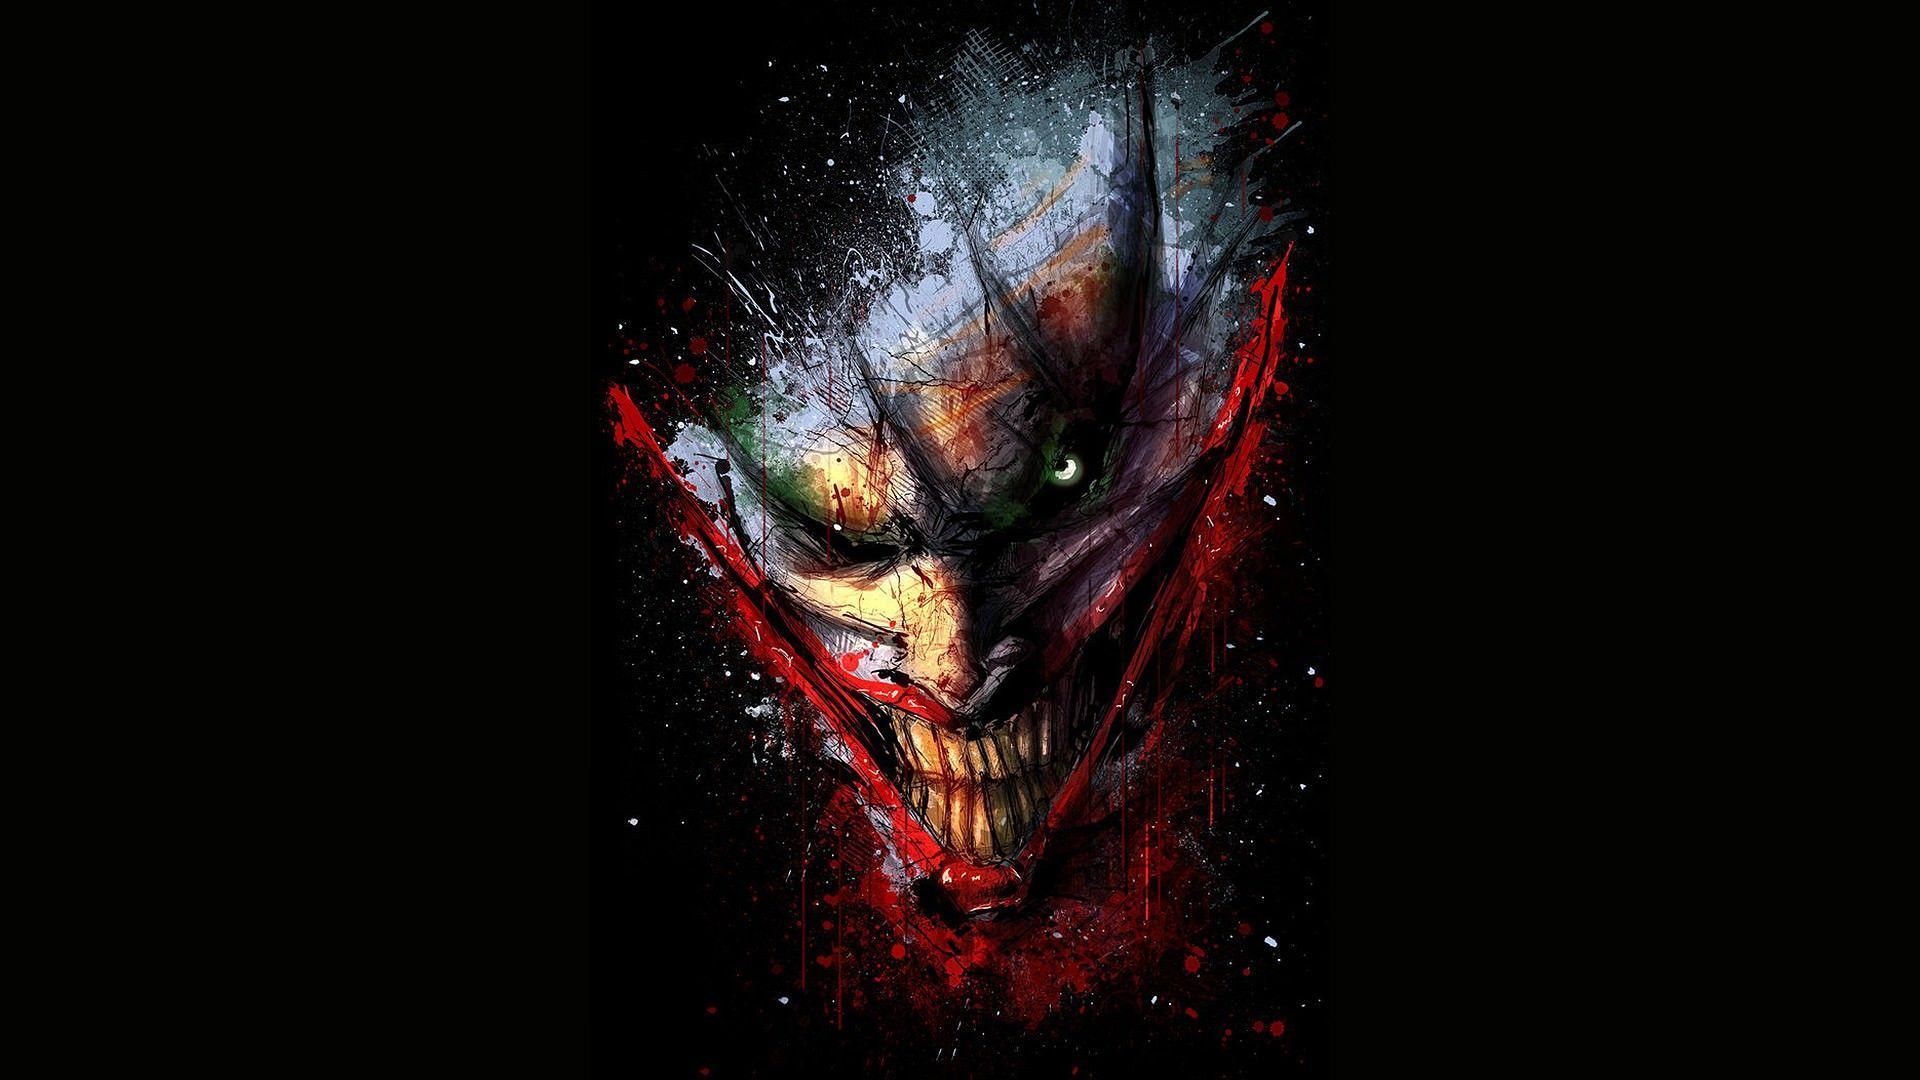 Epic Joker Wallpapers Top Free Epic Joker Backgrounds